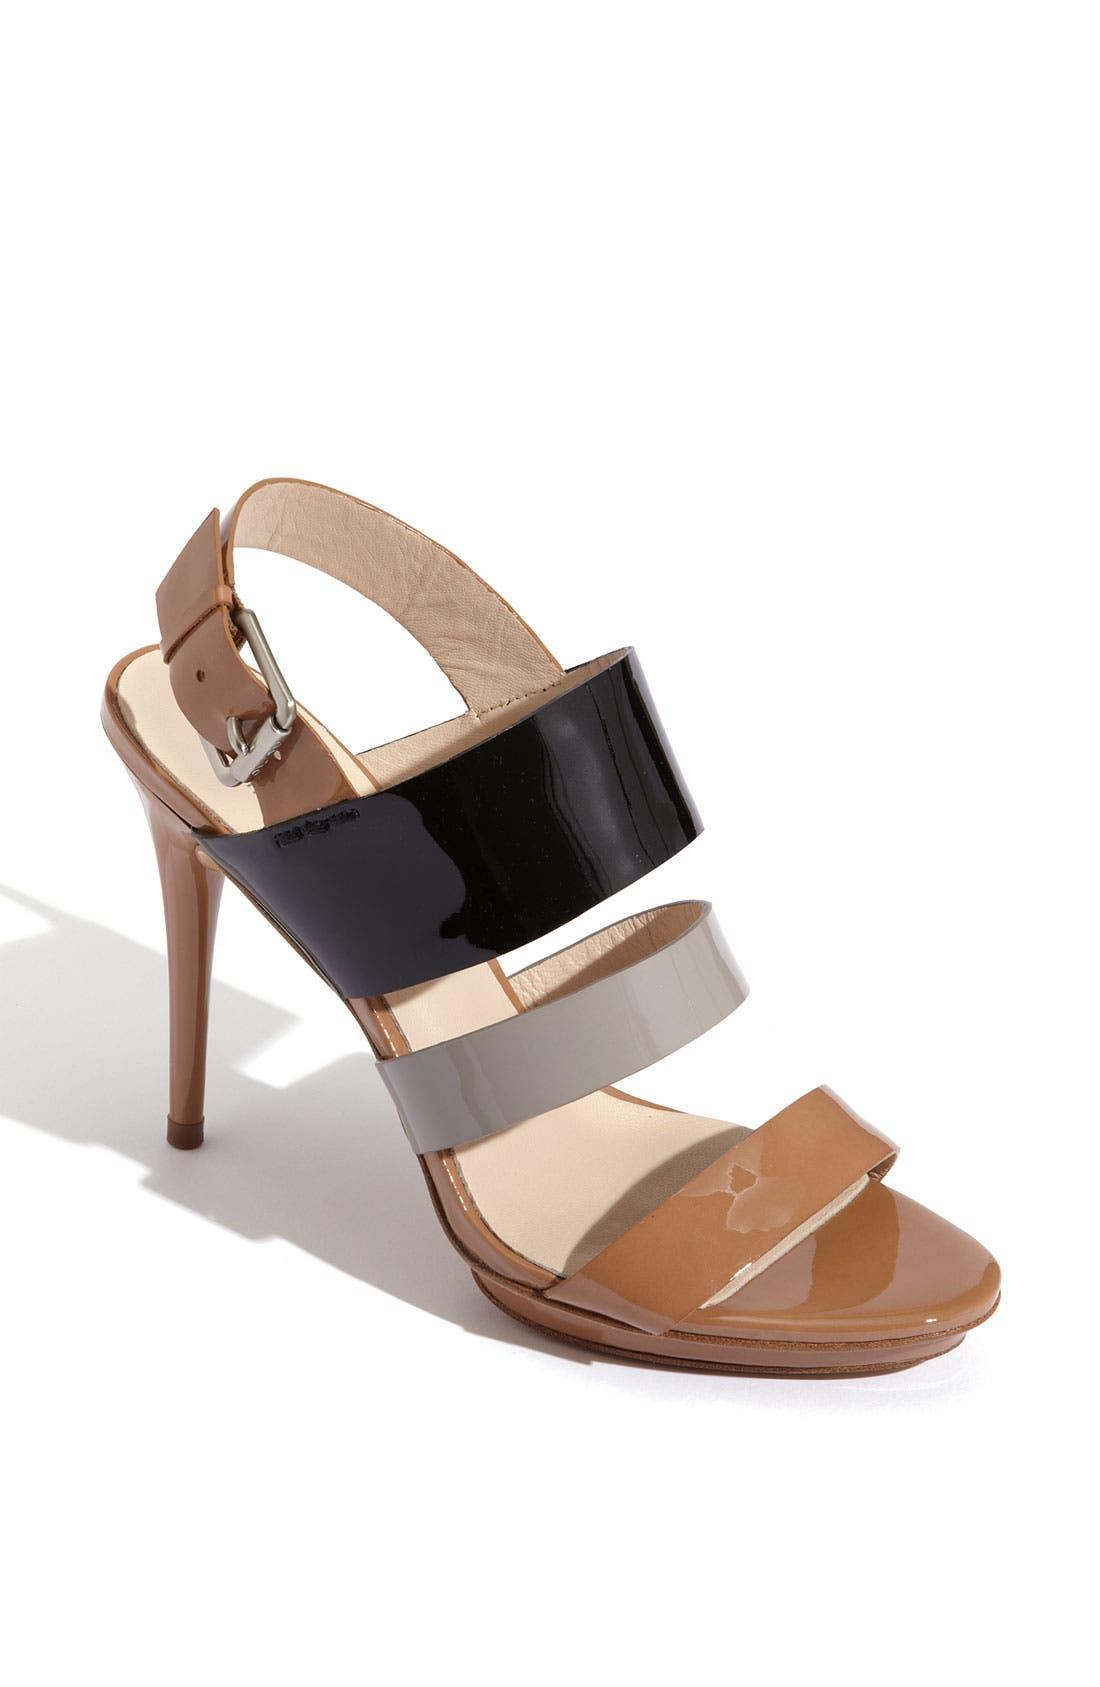 Alternate Image 1 Selected - KORS Michael Kors 'Lizzie' Sandal